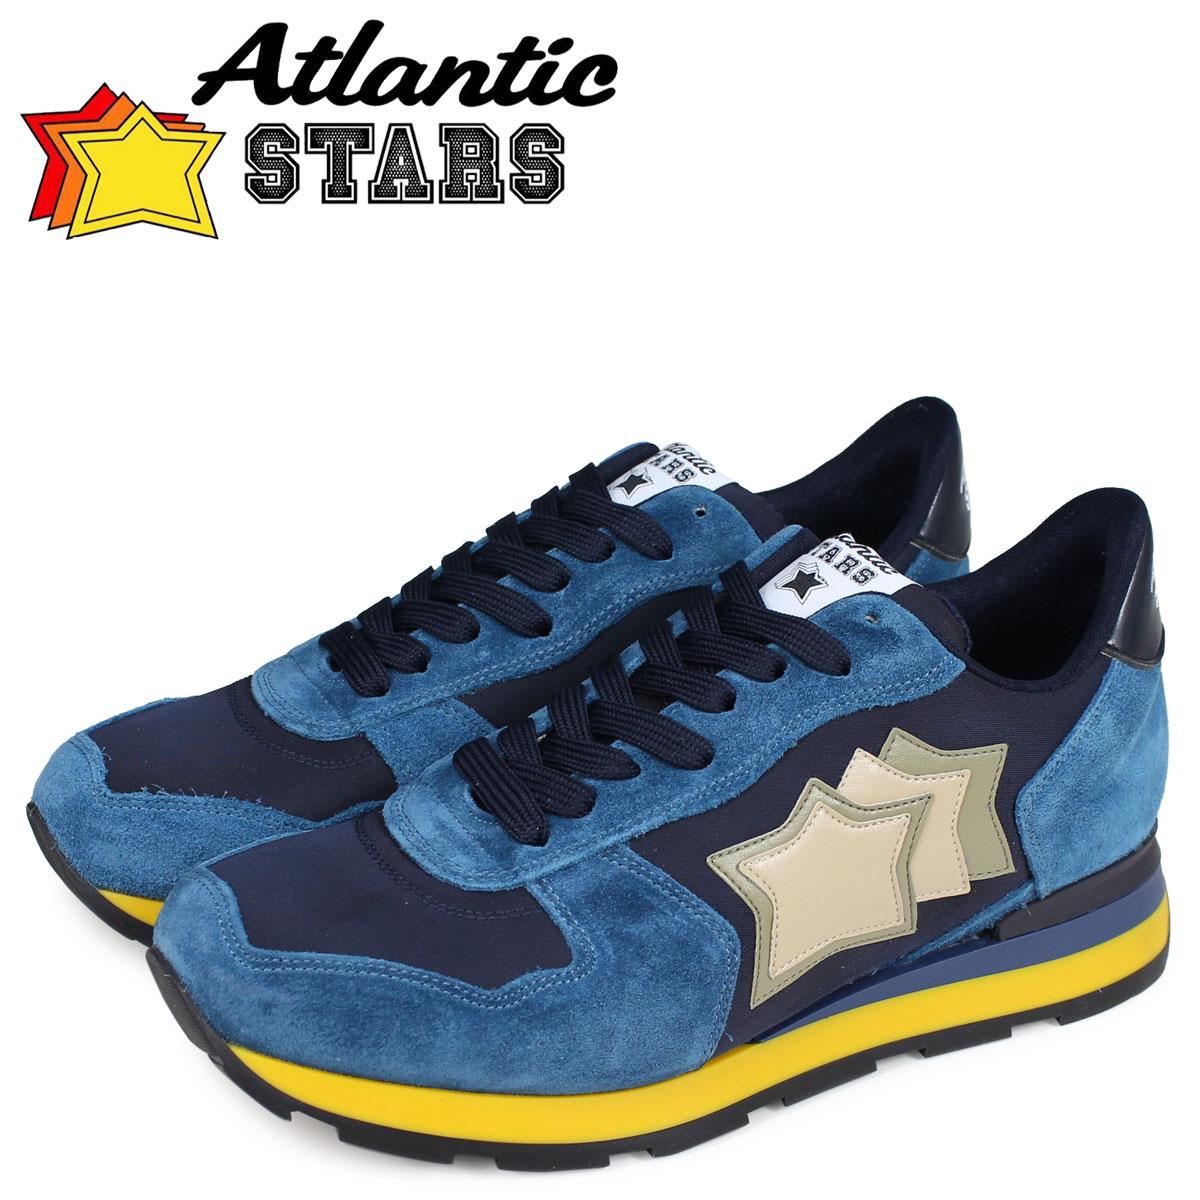 Atlantic STARS メンズ スニーカー アトランティックスターズ アンタレス ANTARES NRE-01NY ネイビー